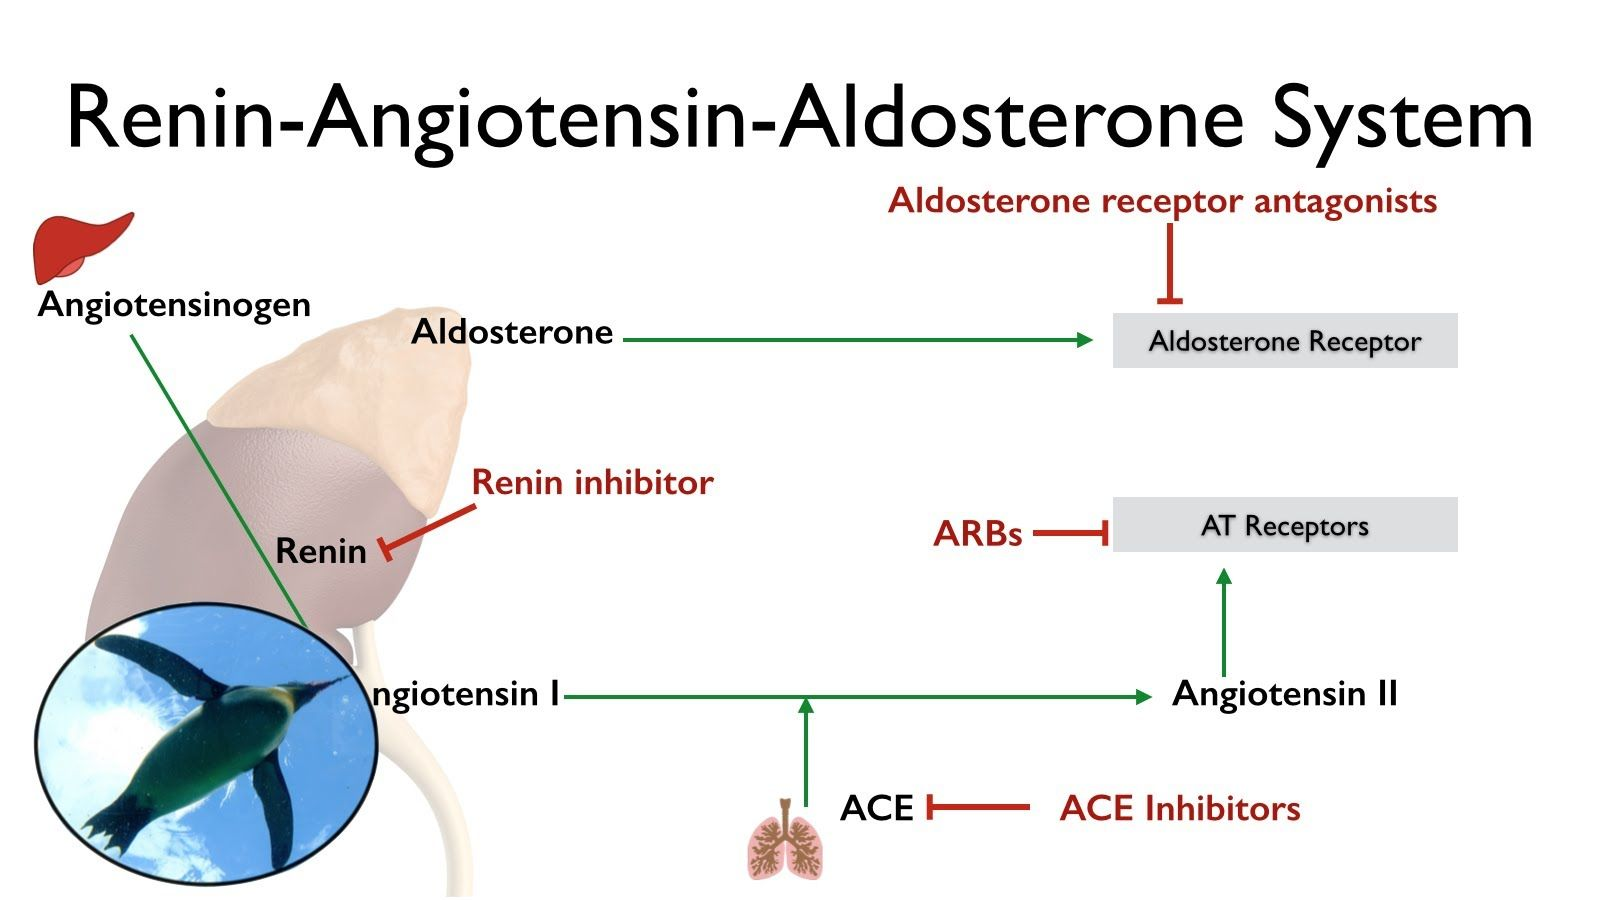 Renin Angiotensin Aldosterone System The Raas